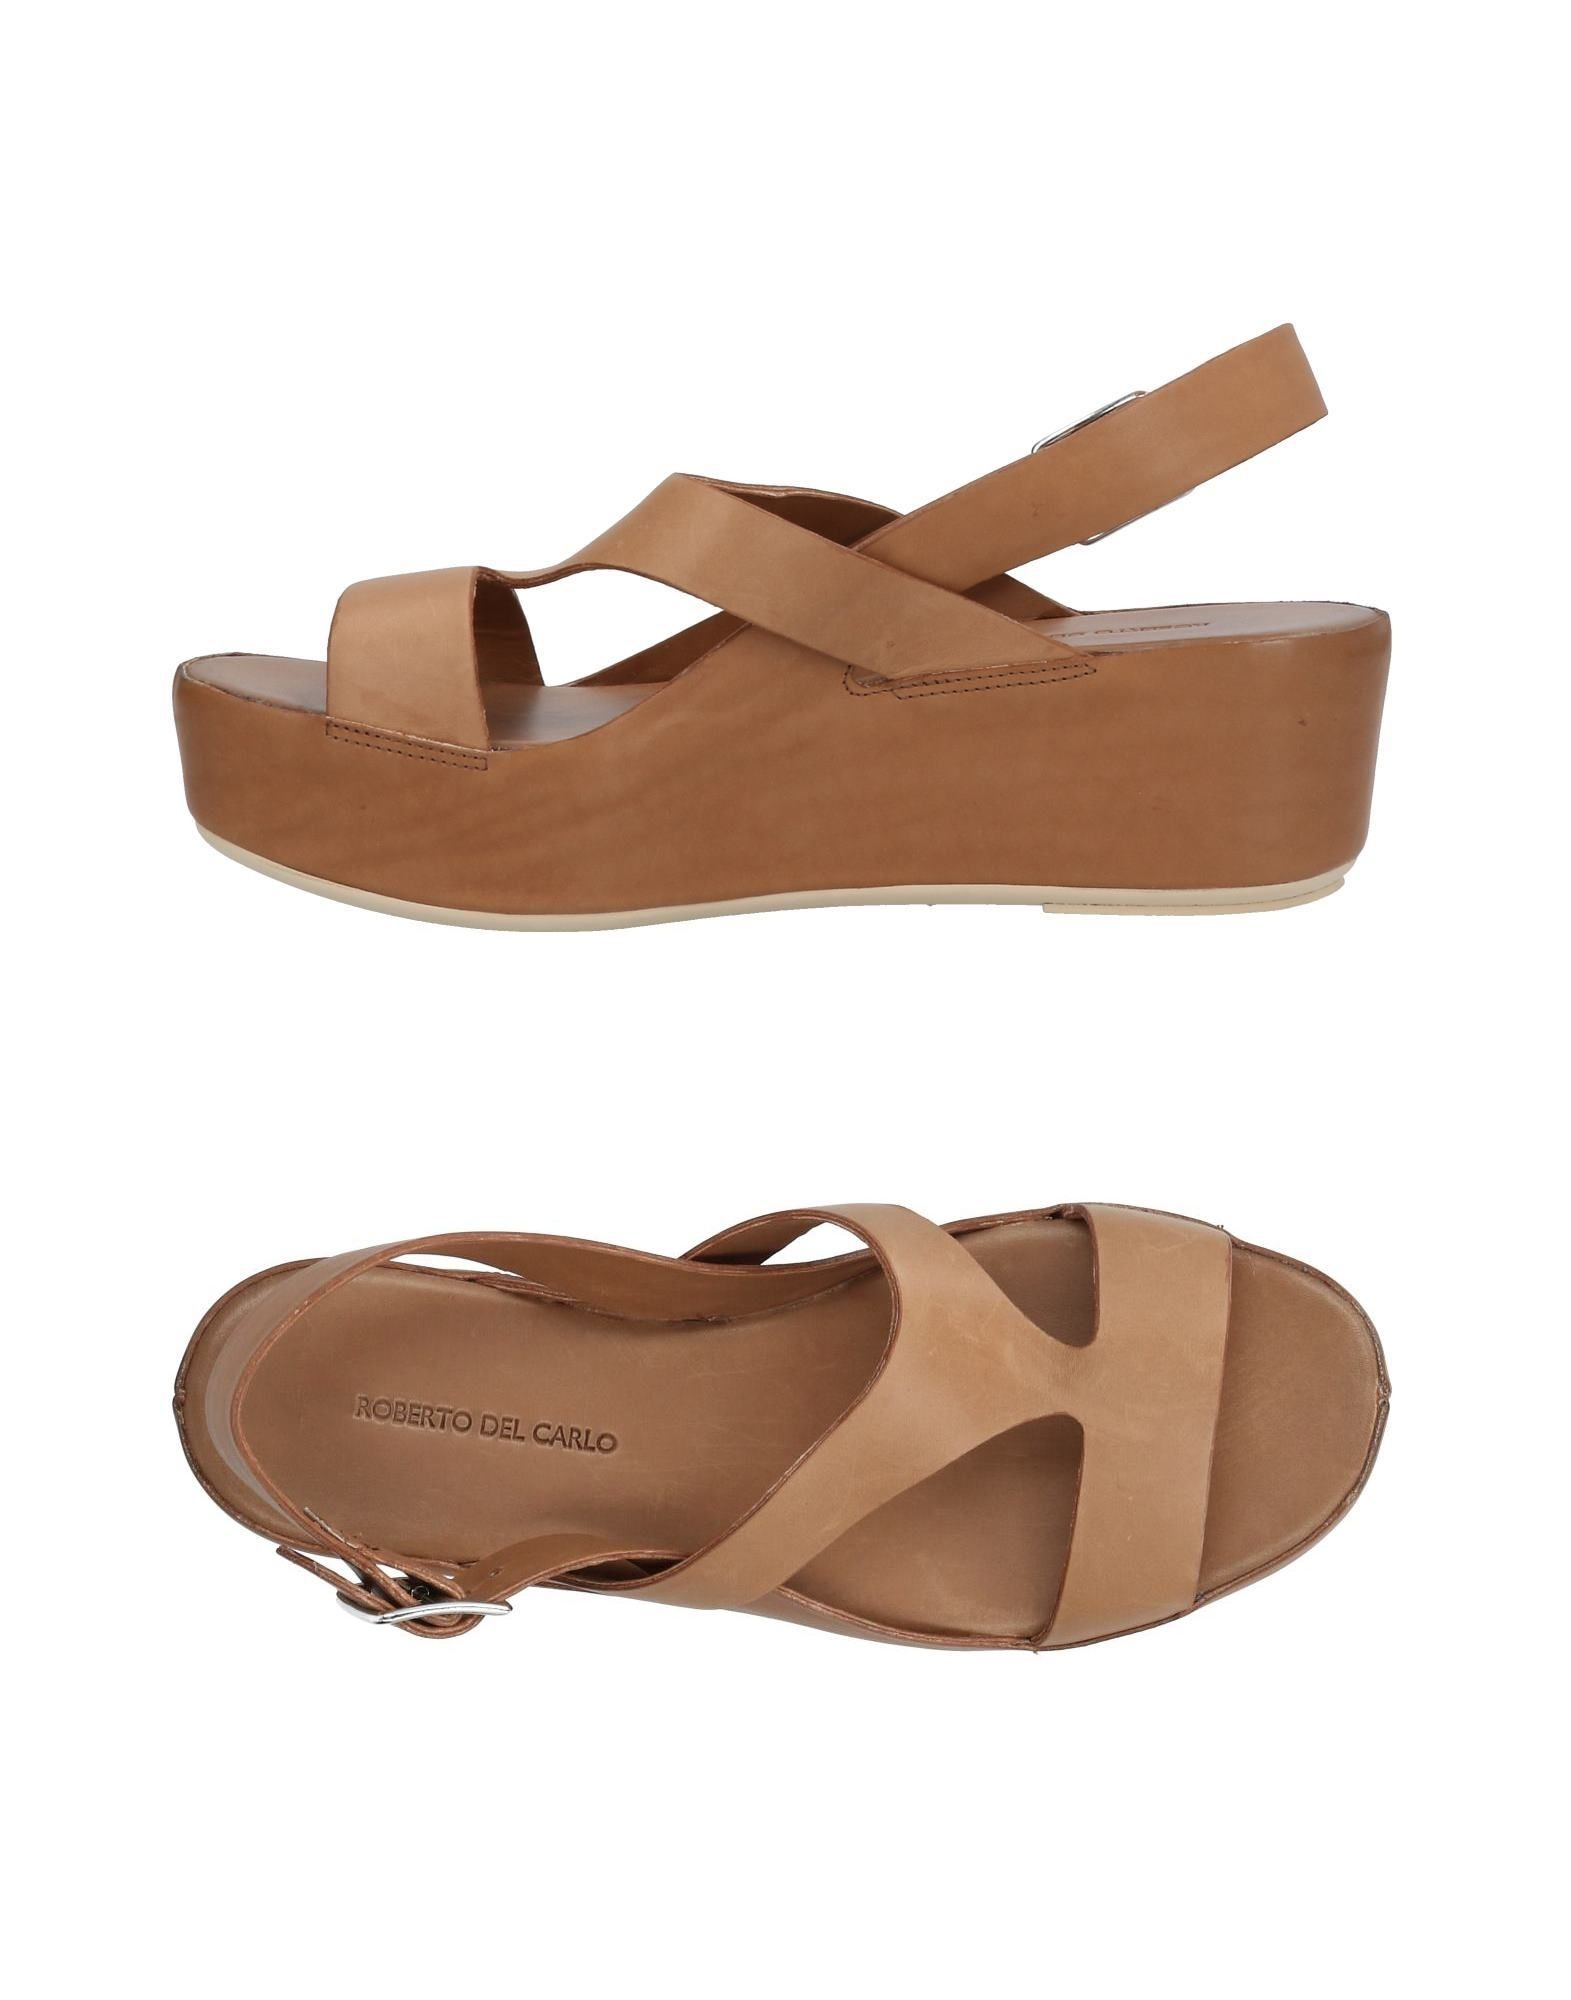 Roberto Del Carlo Sandalen Damen  11425252HKGut aussehende strapazierfähige Schuhe